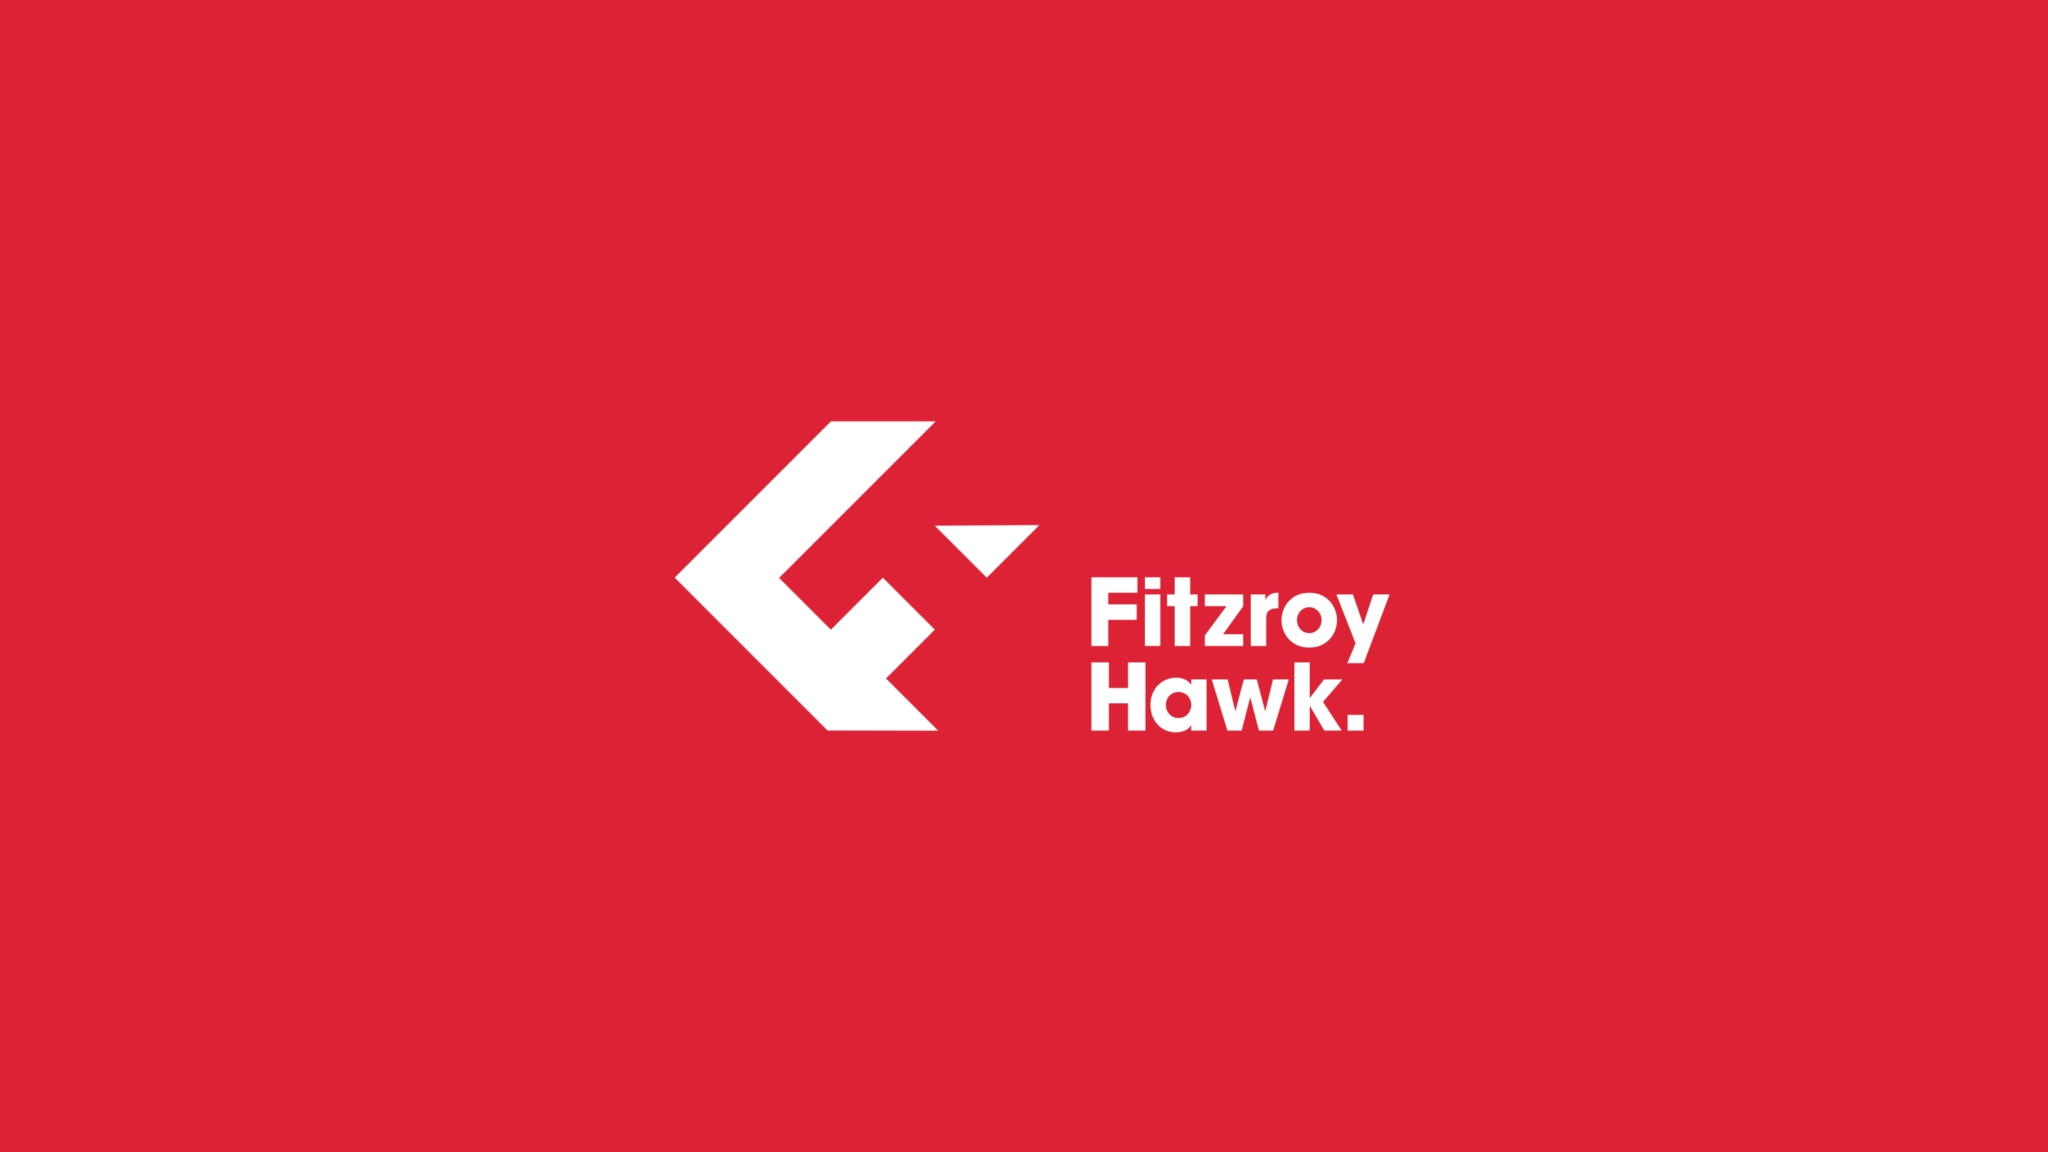 HS Fitzroy Hawk 01